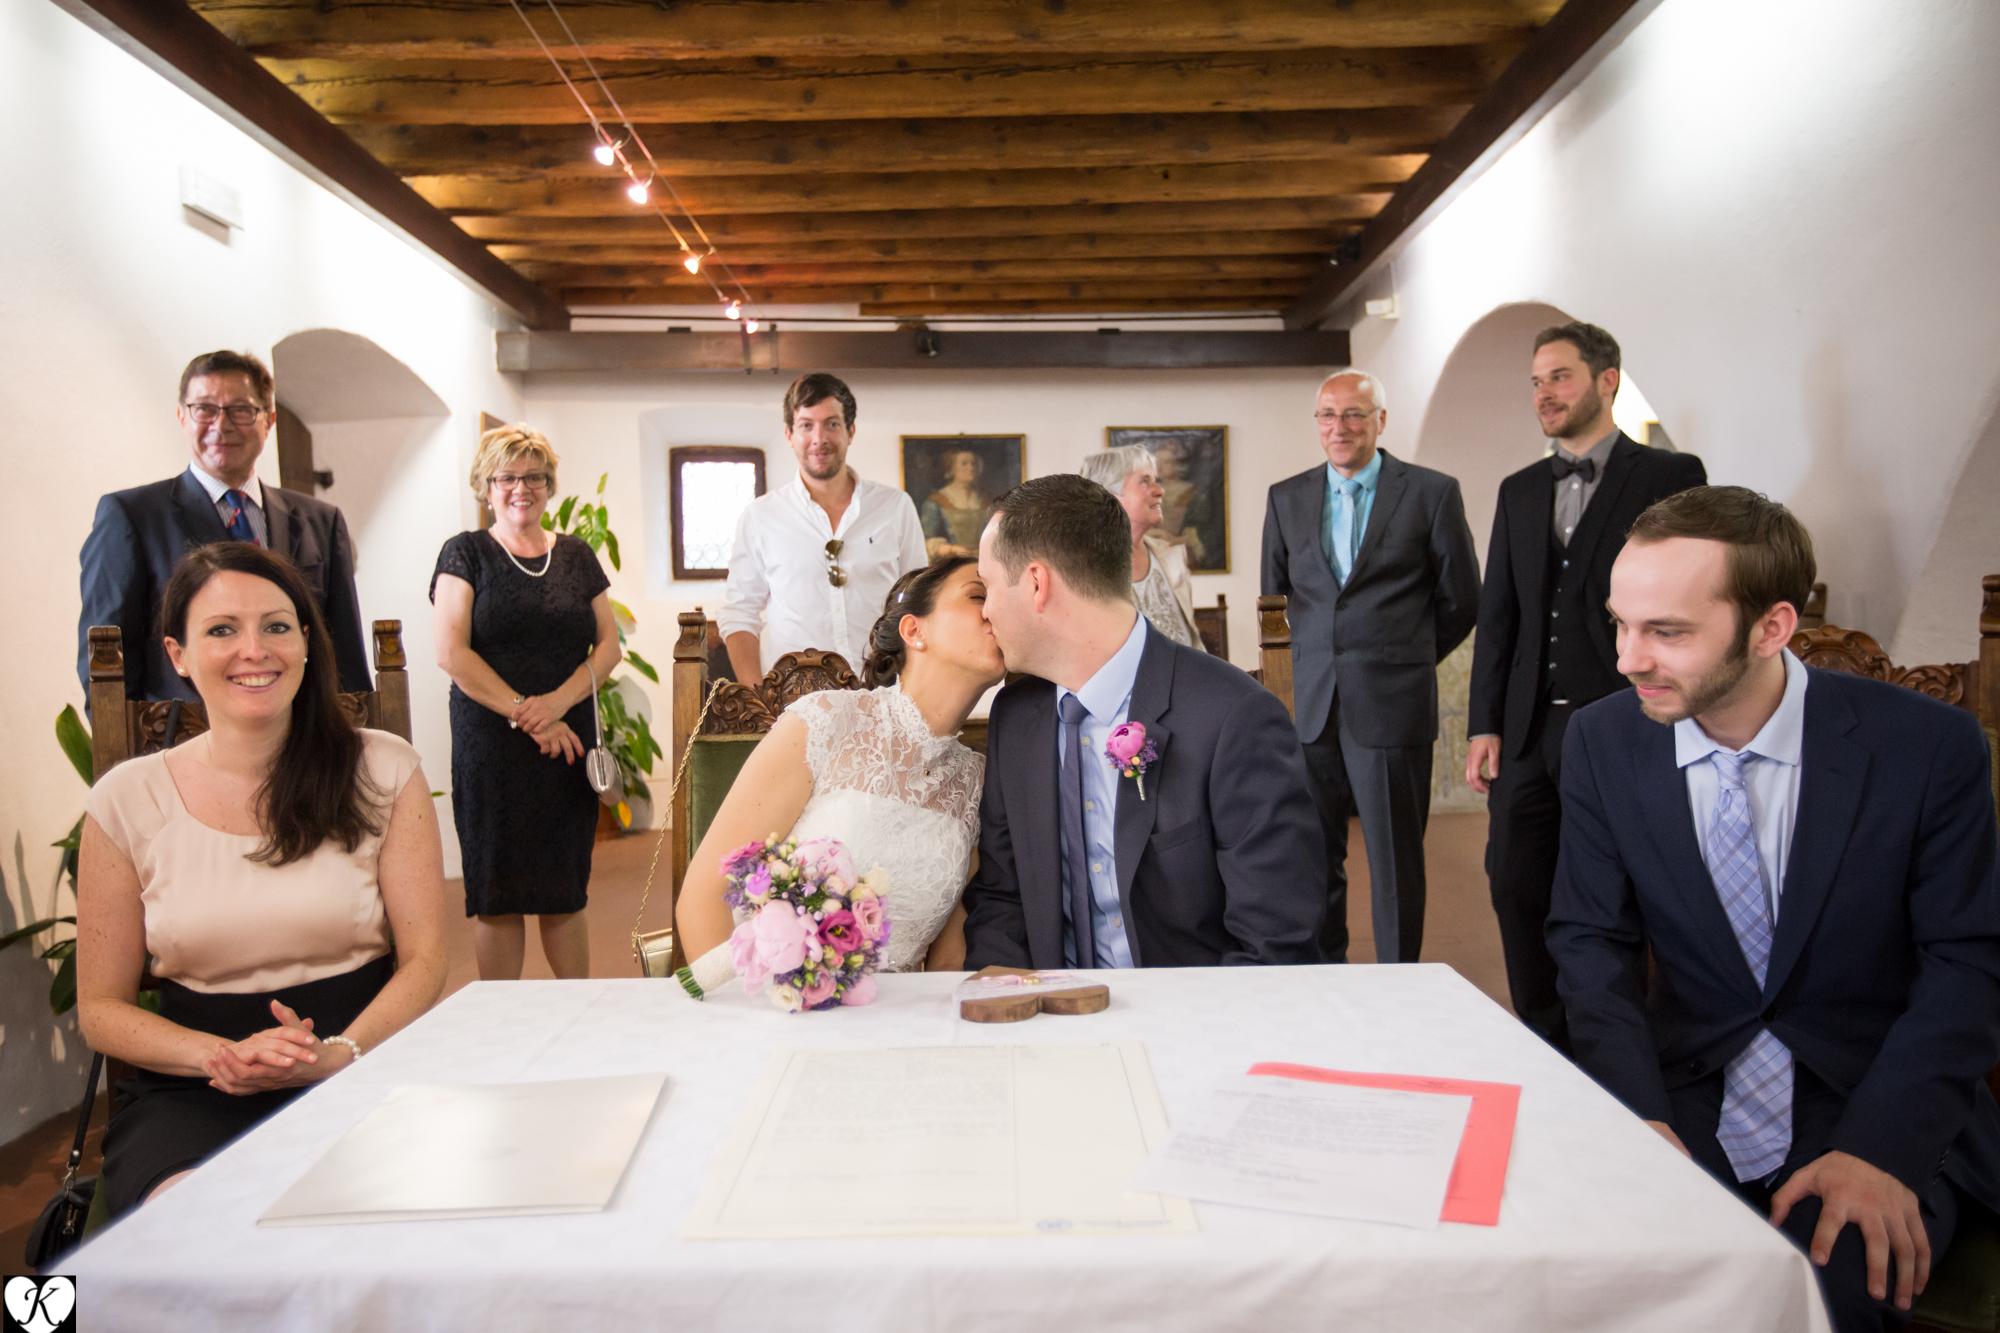 Hochzeit Susi  Aron 05 Juni 2015  Jeremias Konopka